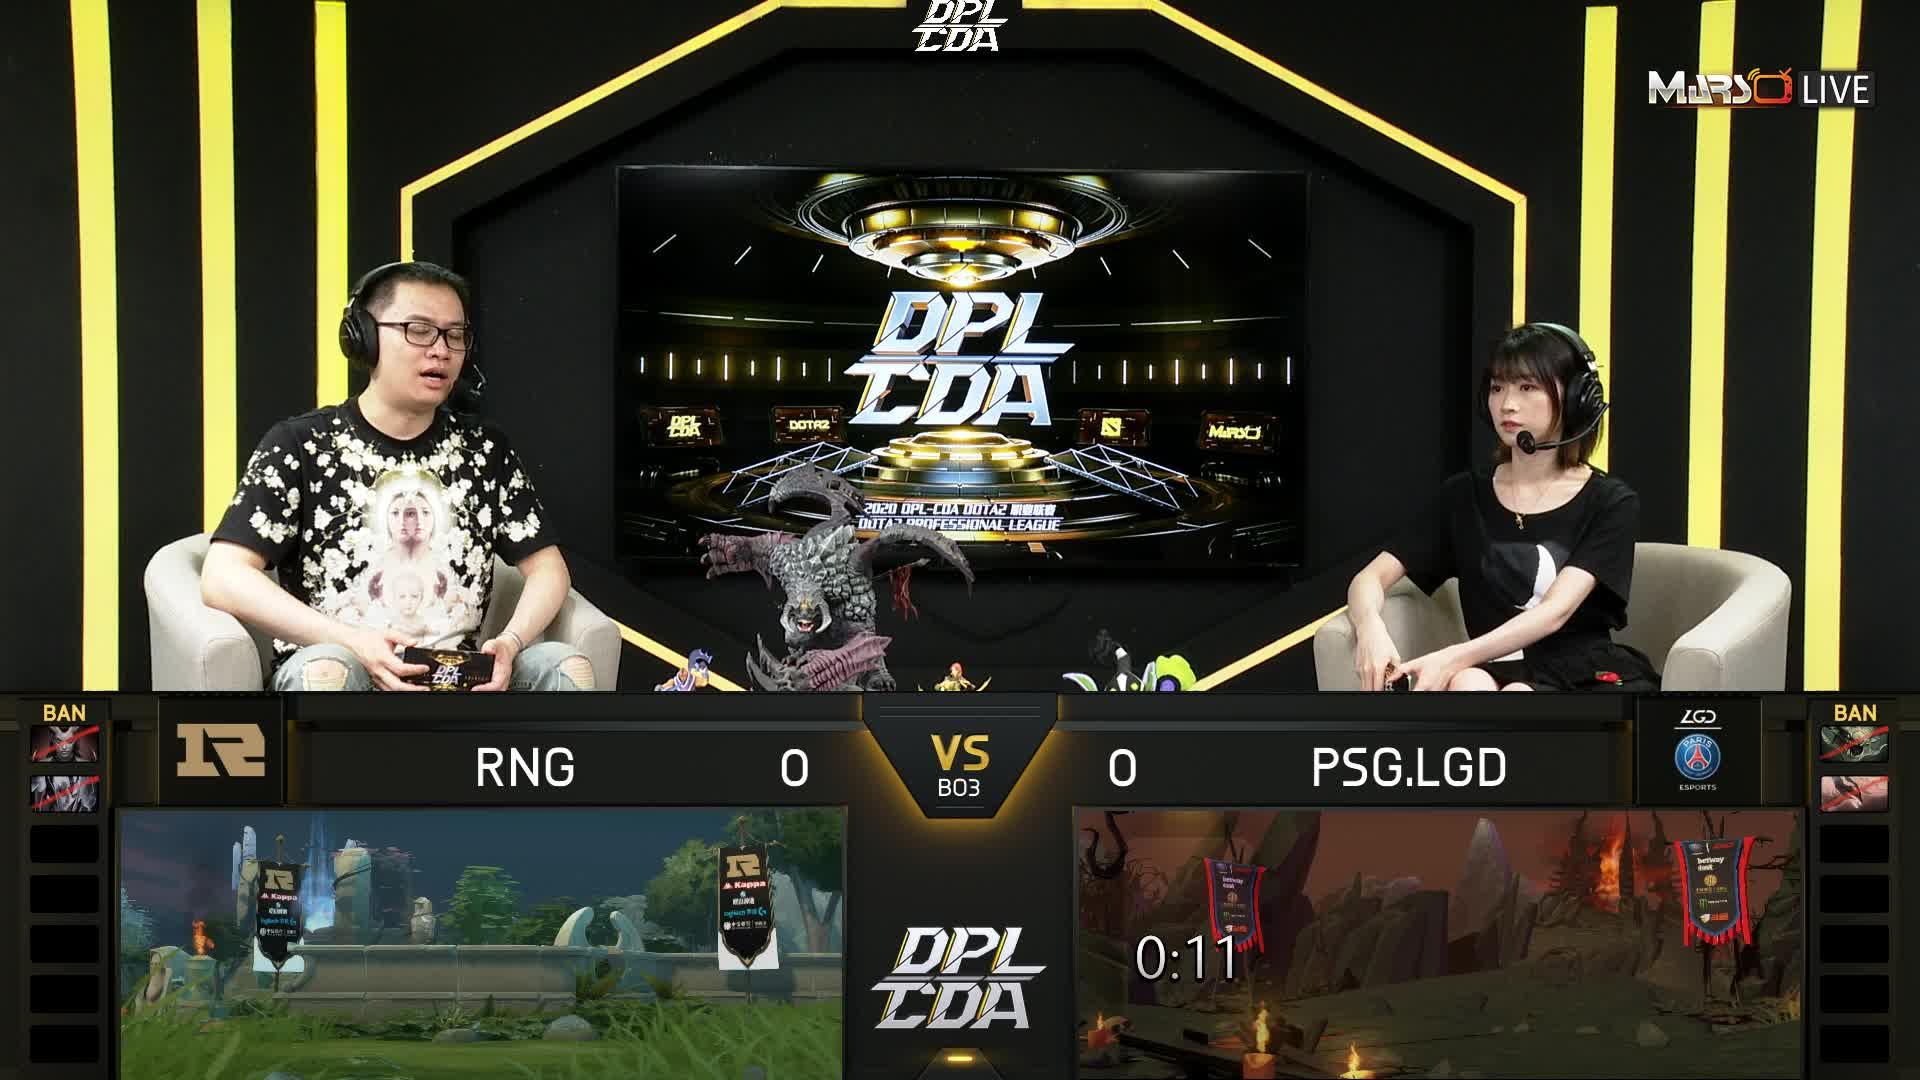 常规赛 PSG.LGD vs RNG - 1